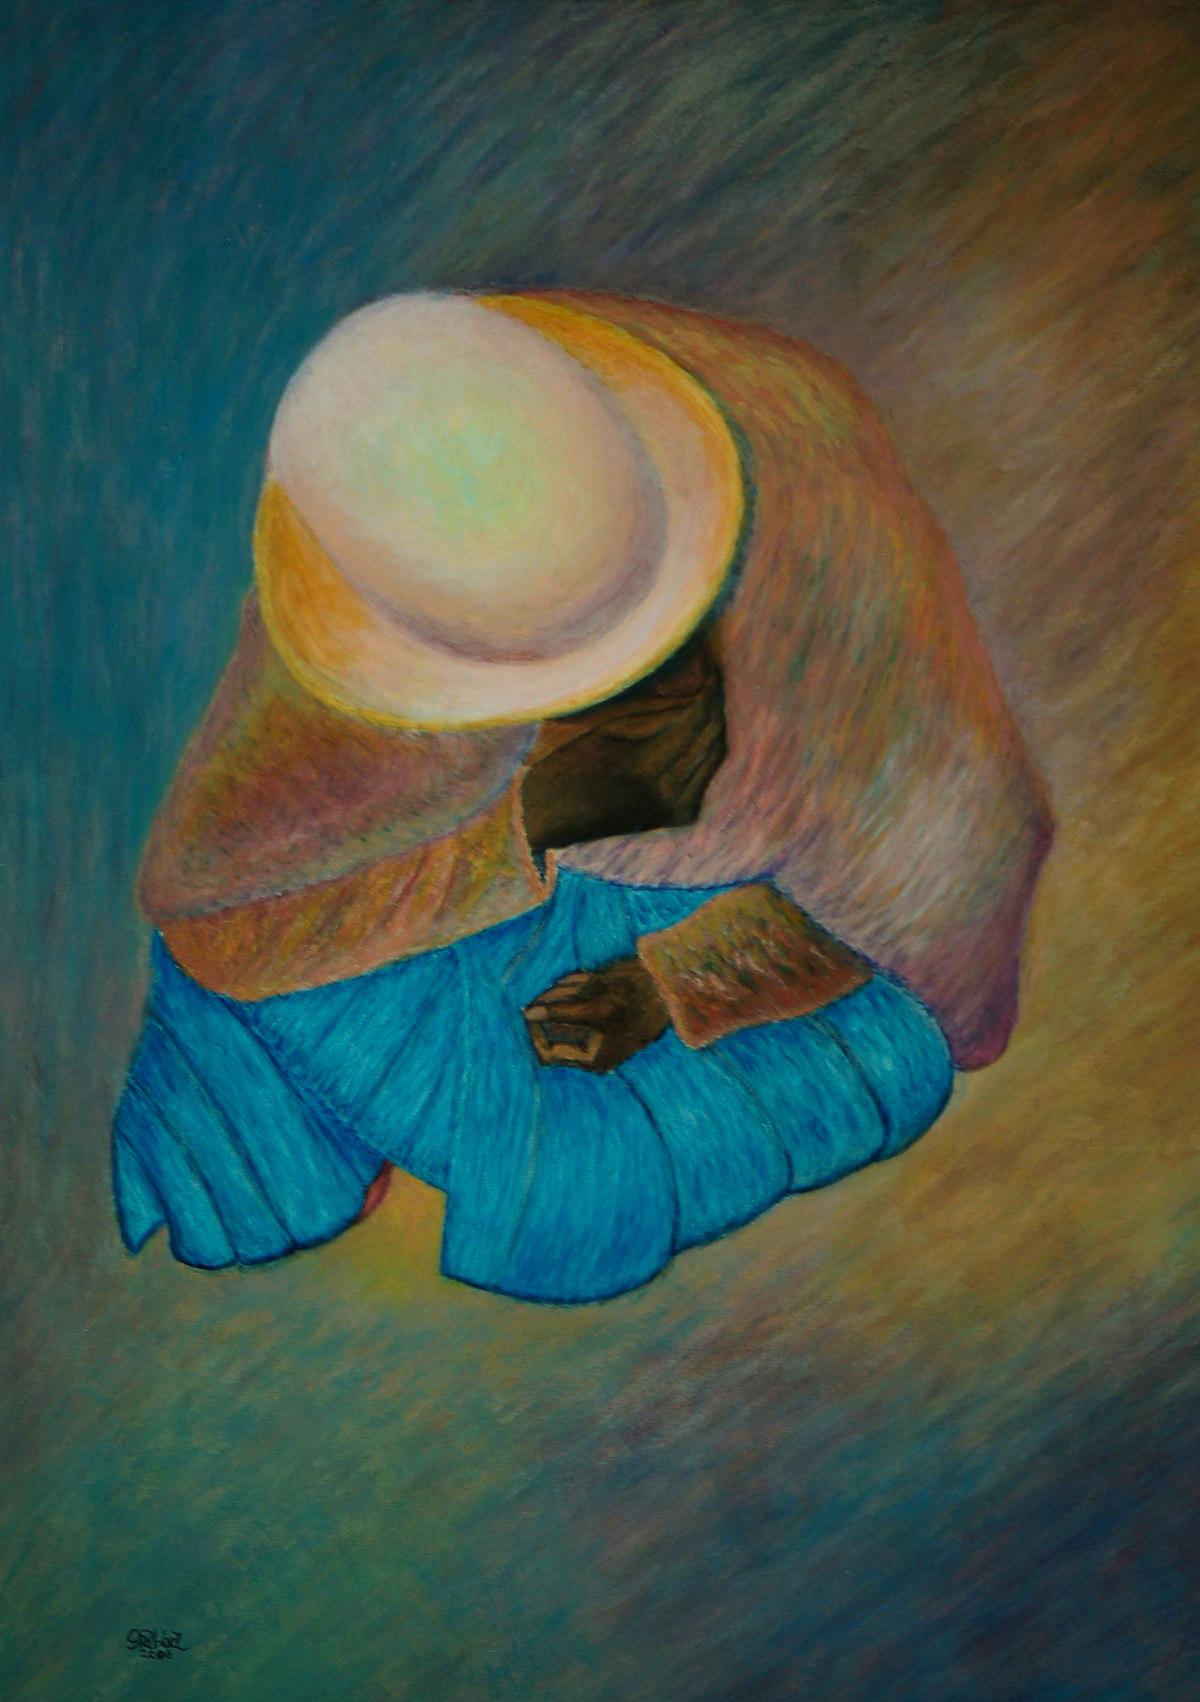 Amerikai álom (akril, vászonborítású farost, 60x90 cm), 2004